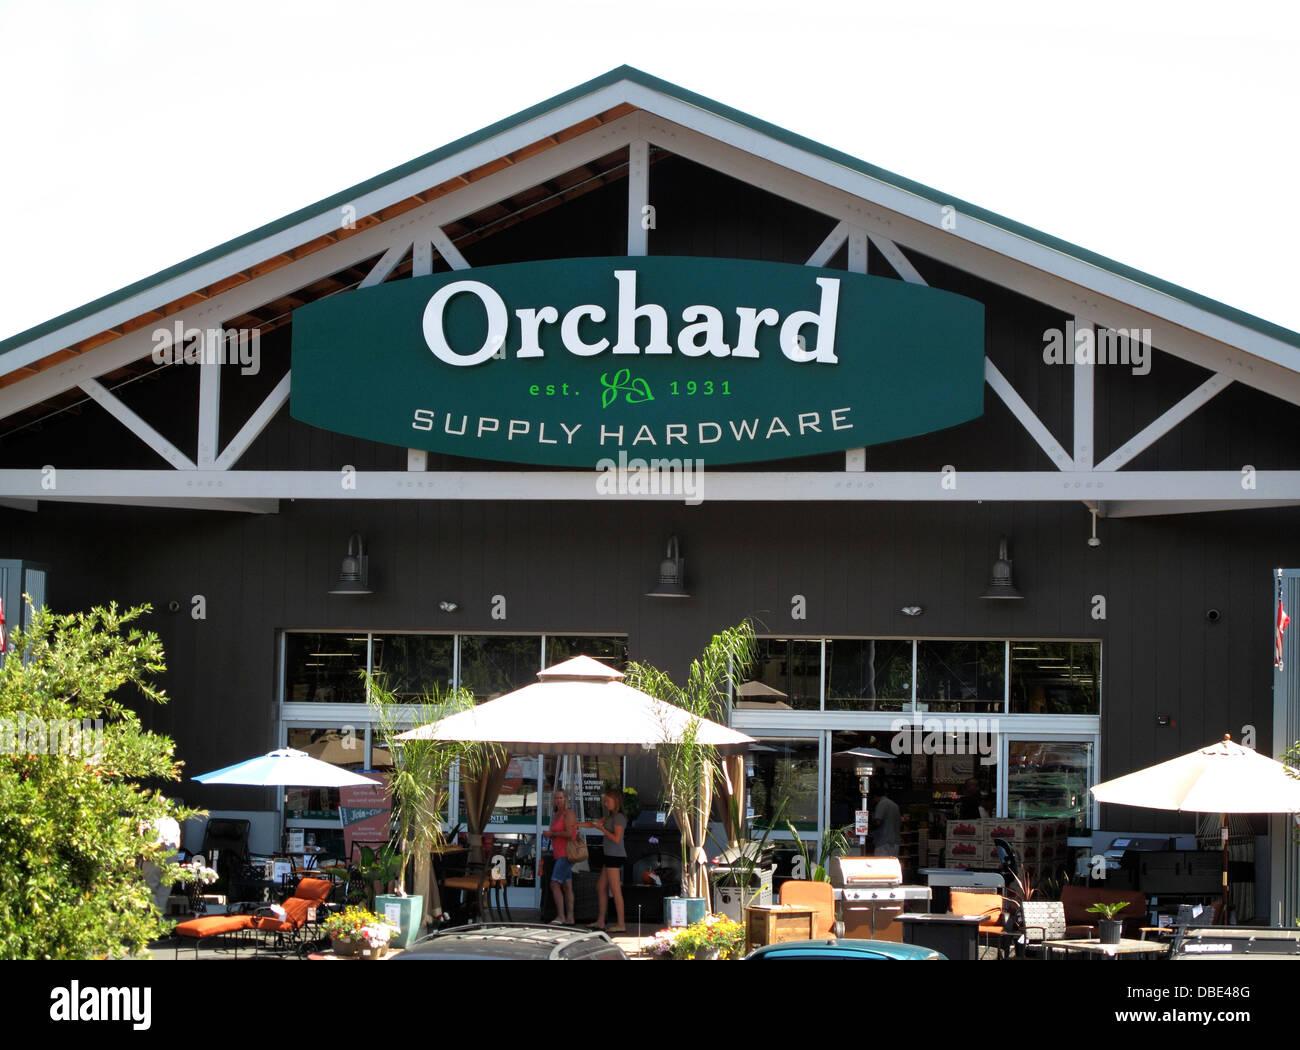 Orchard Supply Hardware Store At Princeton Plaza In San Jose, California    Stock Image